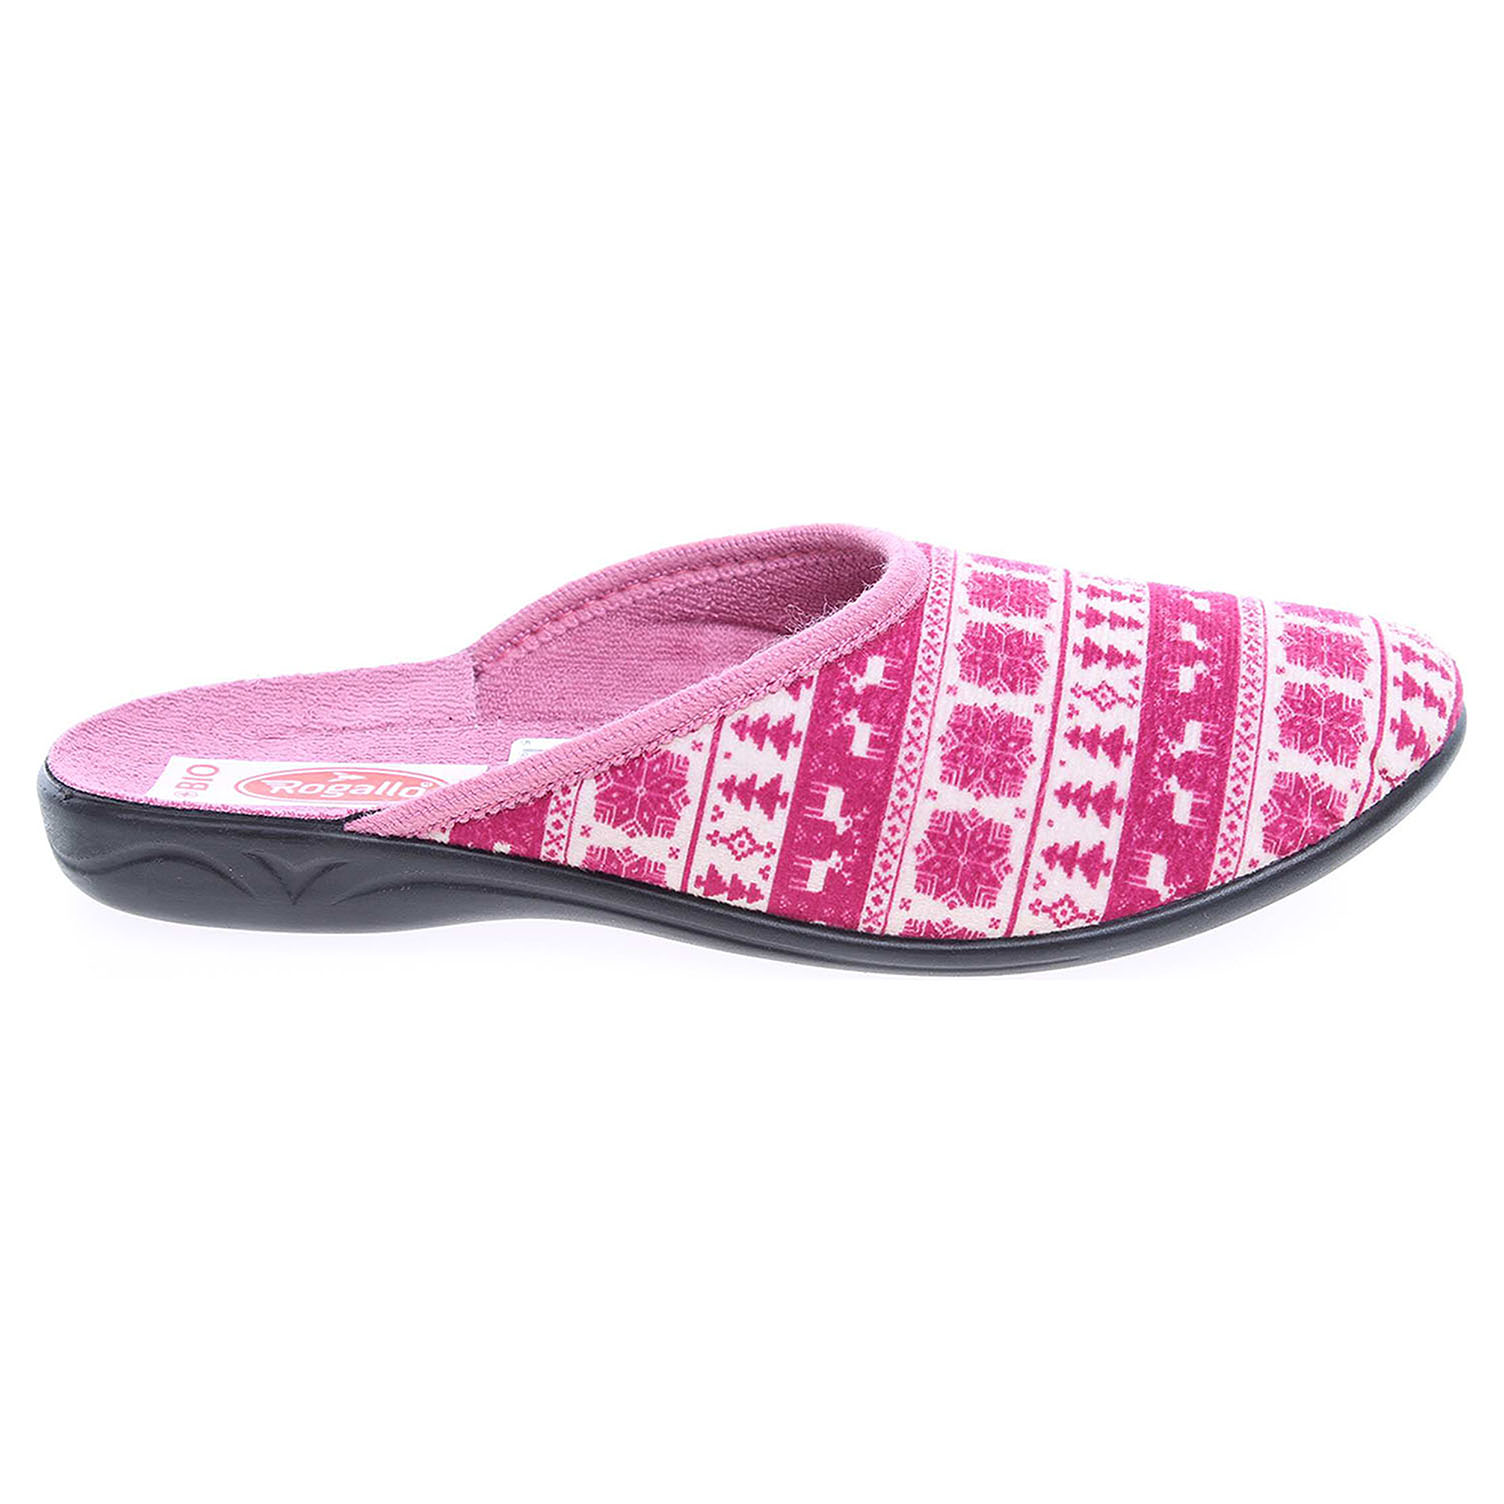 Ecco Rogallo domácí pantofle 19248 růžové 23500399